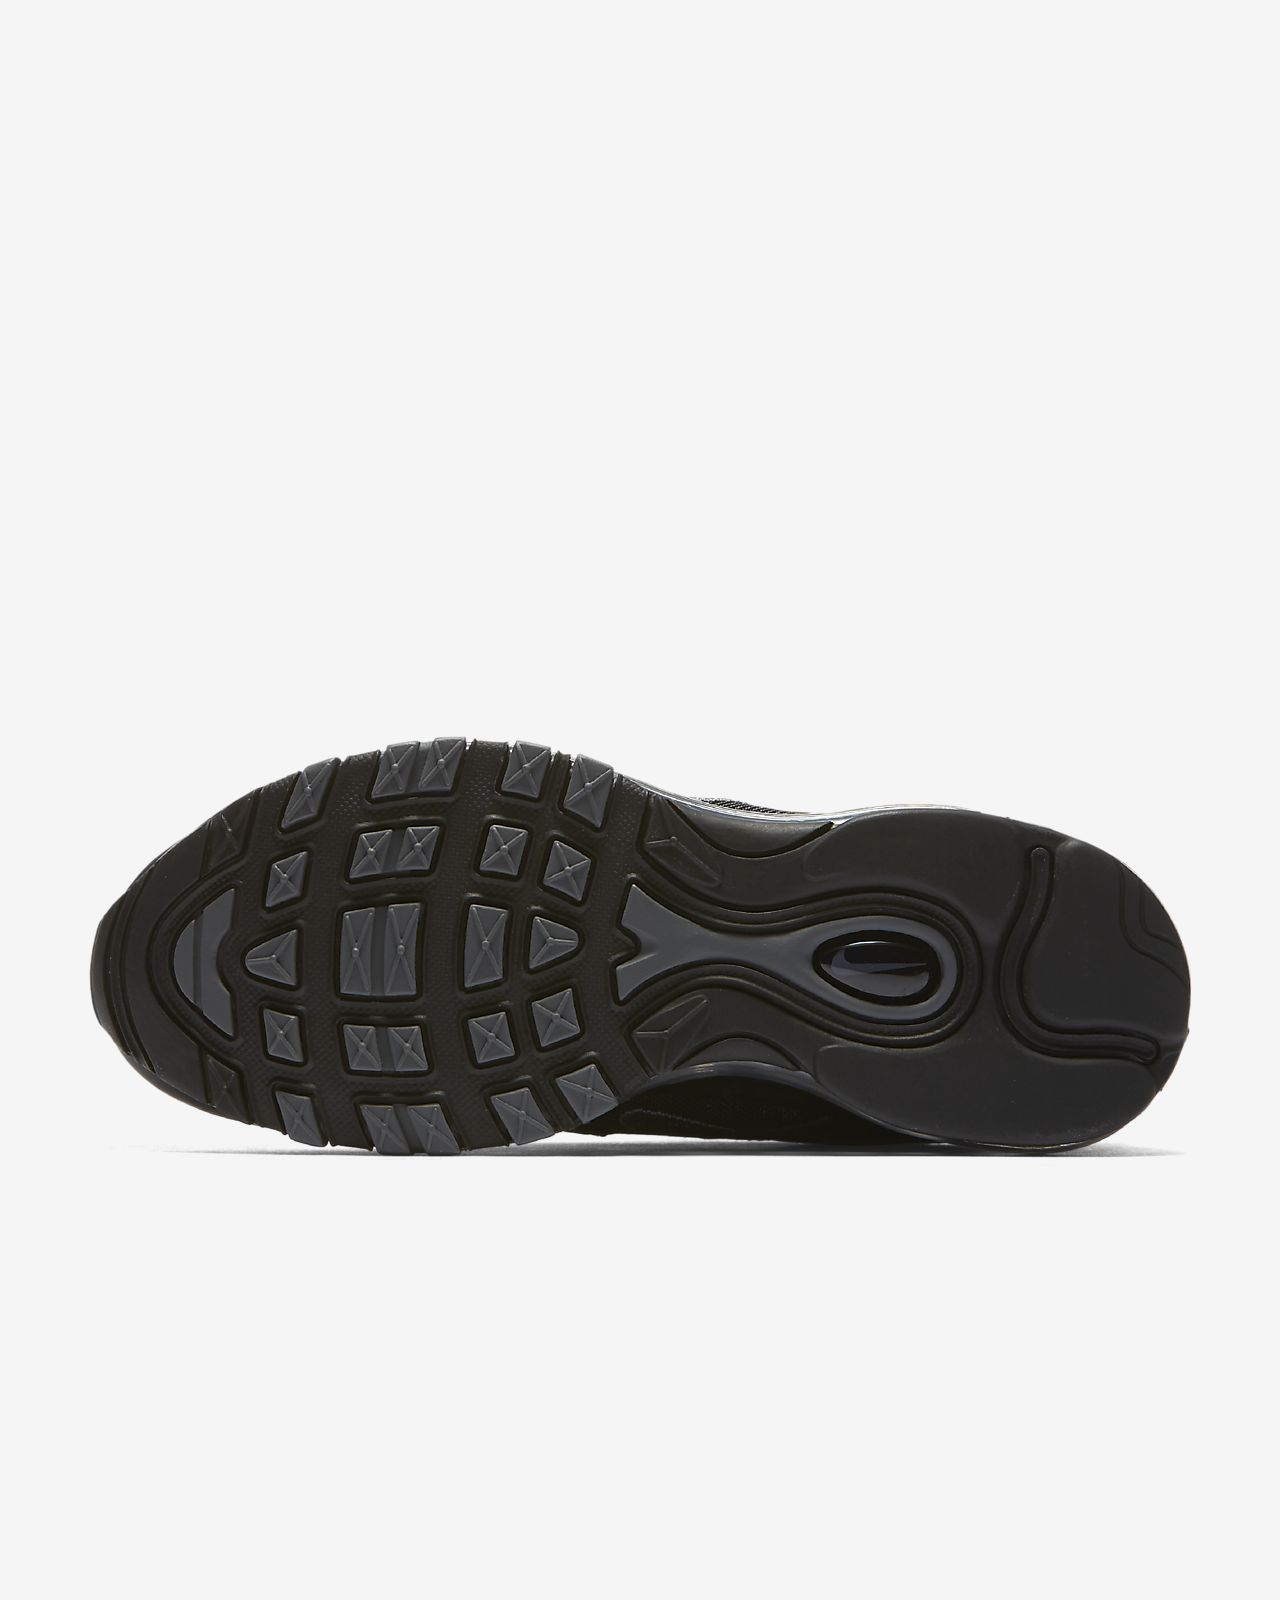 Damen Low Tops | Nike Nike Wmns Air Max 97 Lux Light Silver